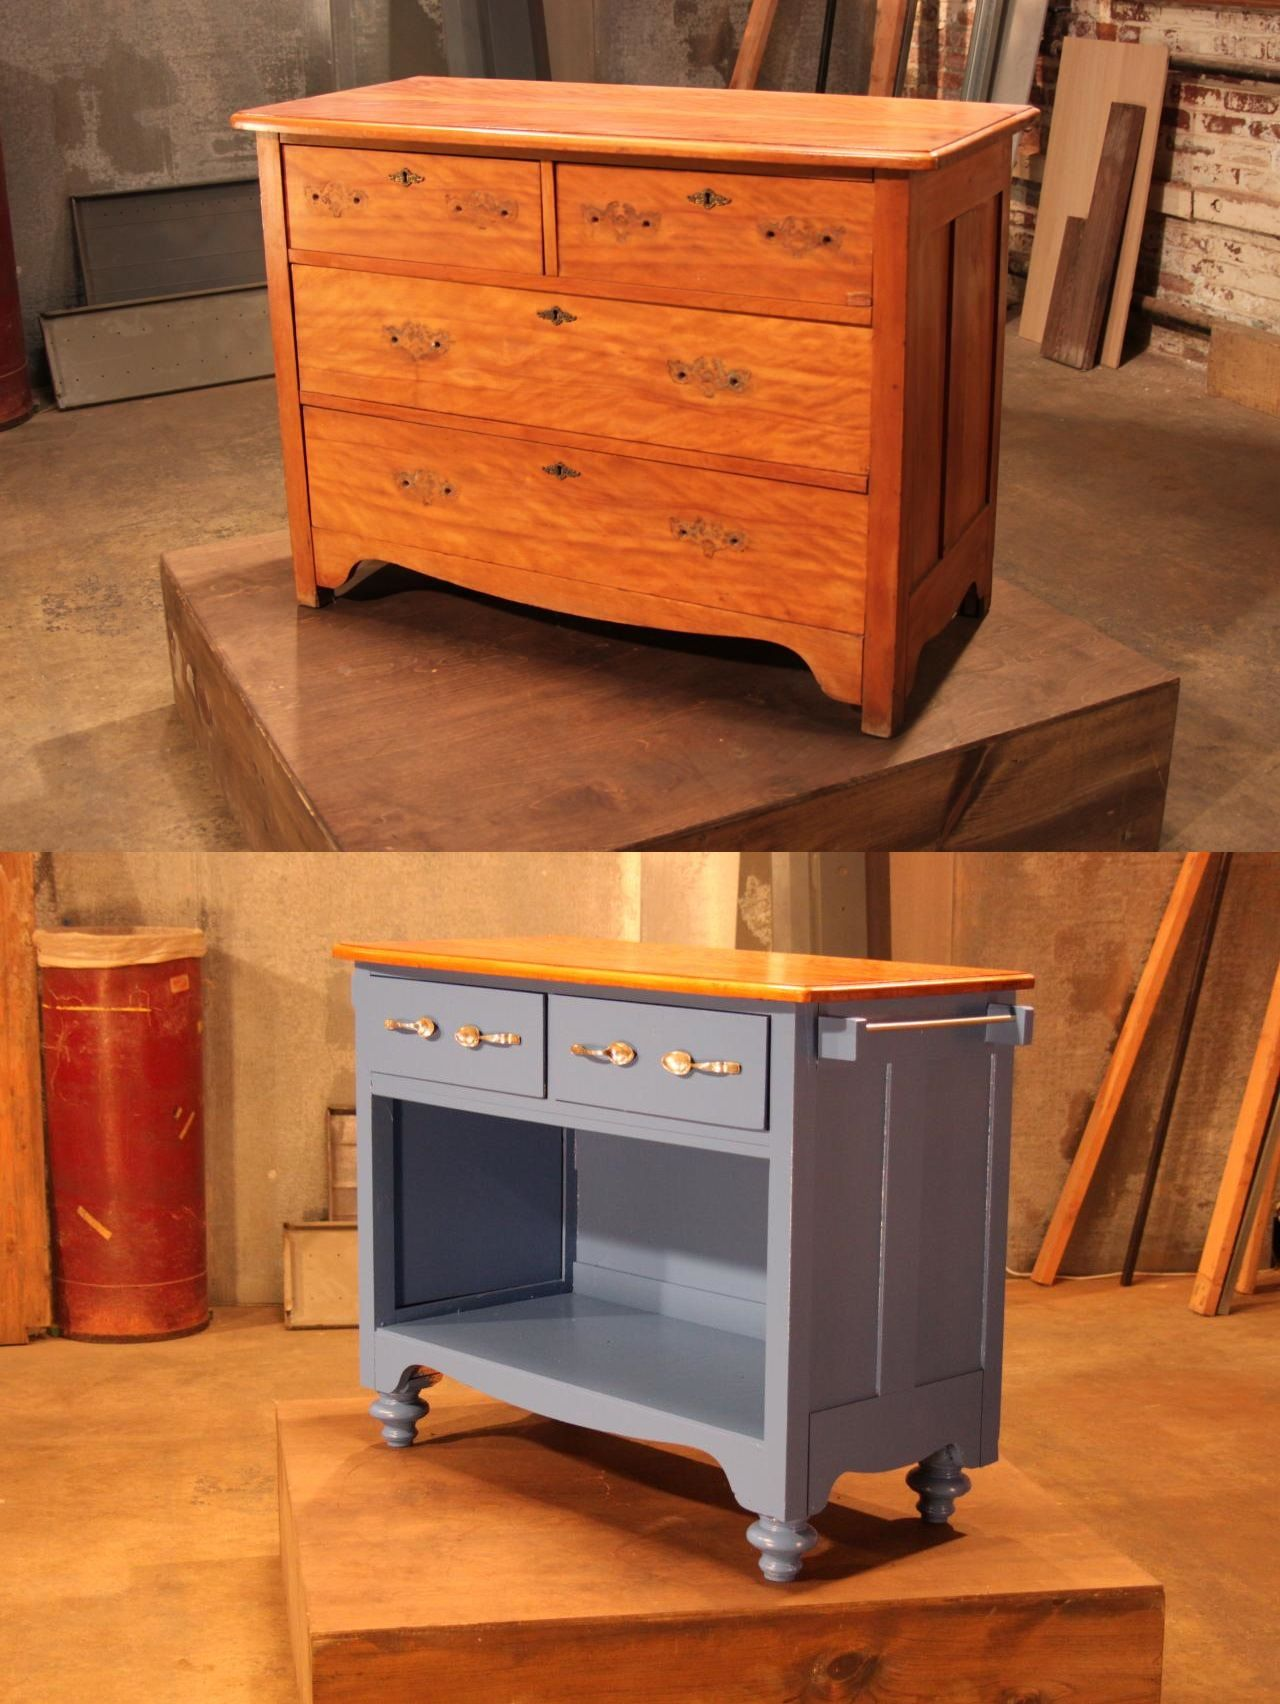 Repurposed Antique Dresser As A Kitchen Island With A: Dresser Repurposed As Kitchen Island.